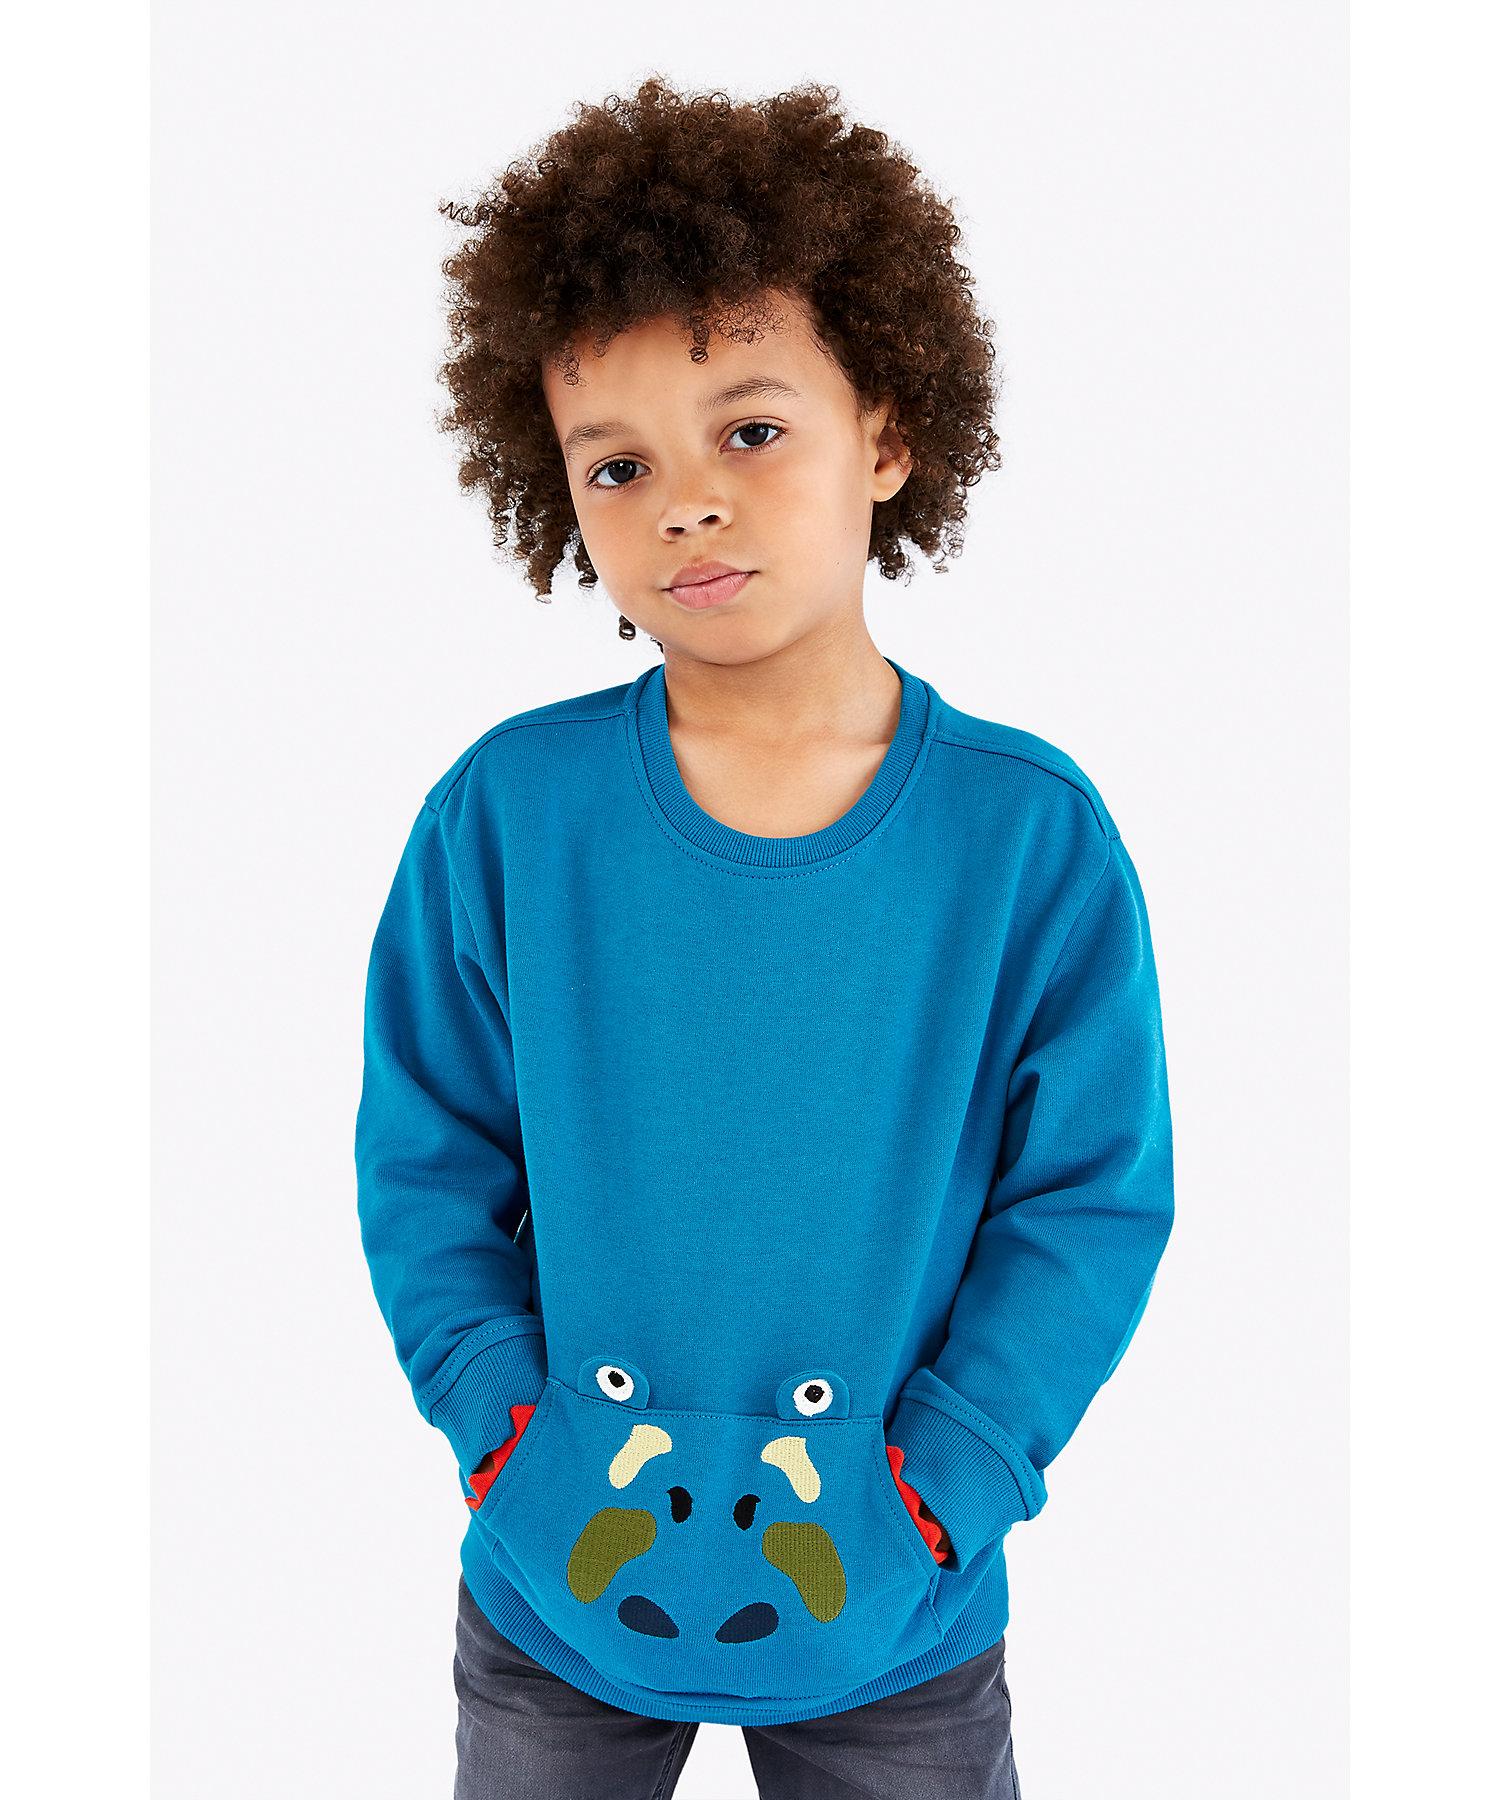 Mothercare | Boys Full Sleeves Sweatshirt 3D Dino Details - Blue